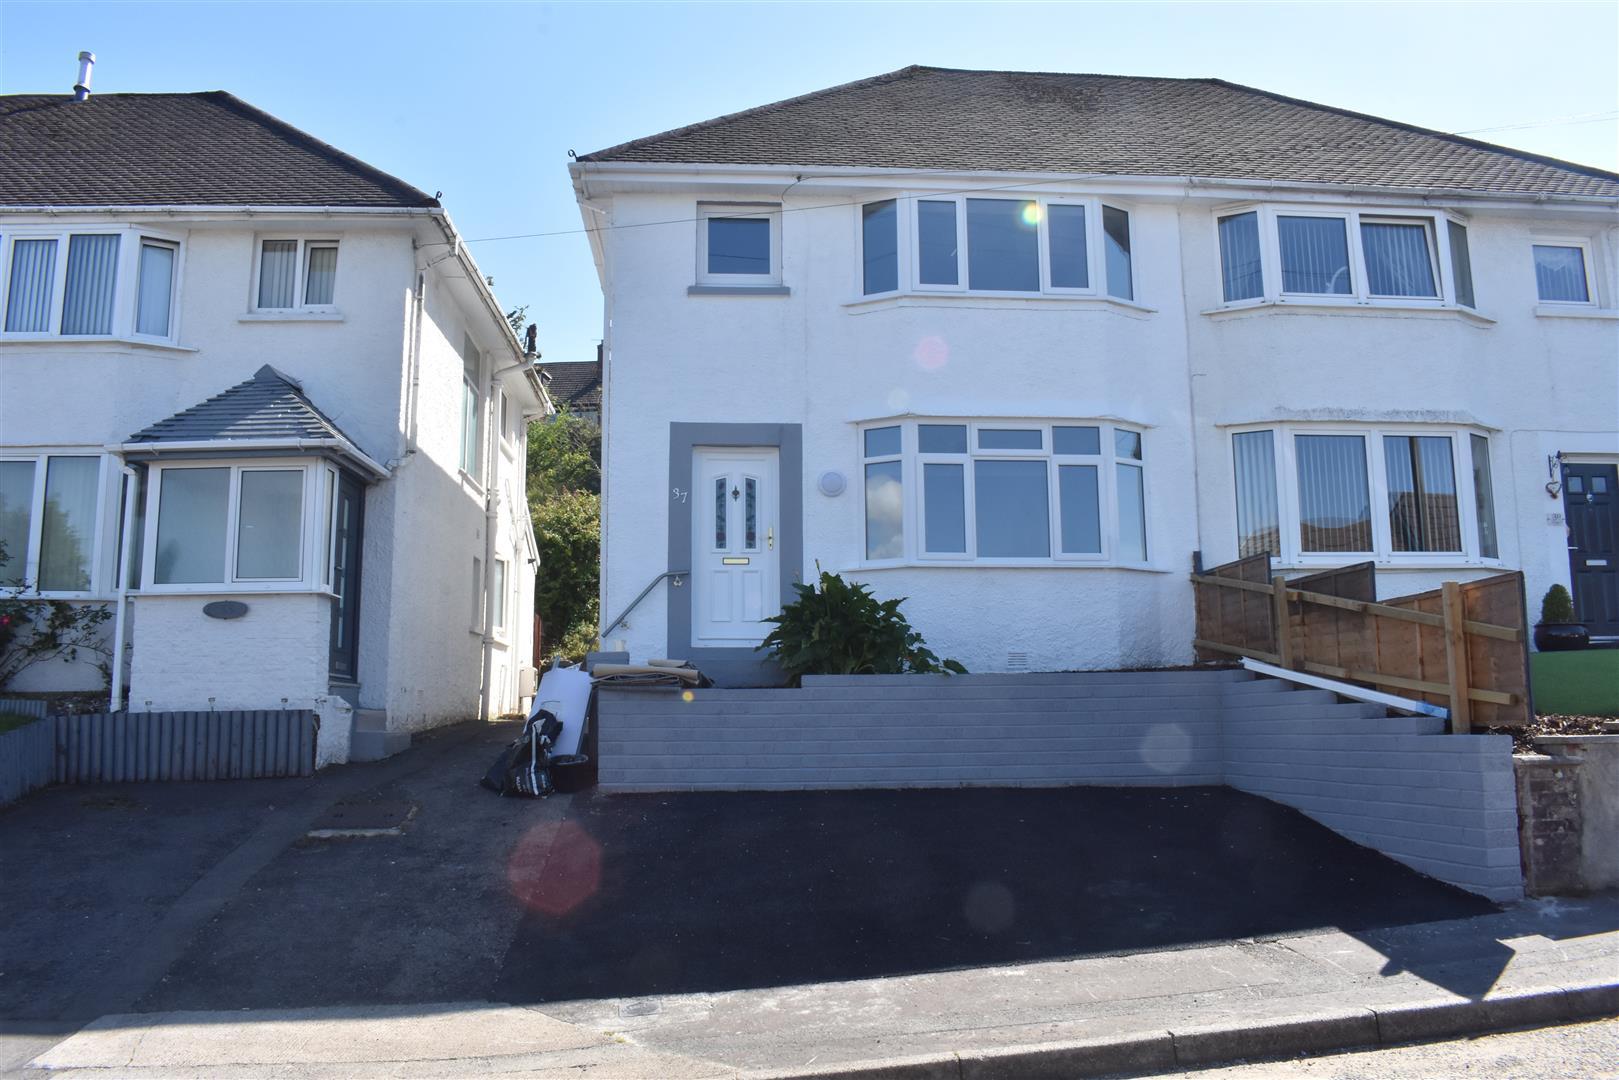 New Road, Cockett, Swansea, SA2 0GA